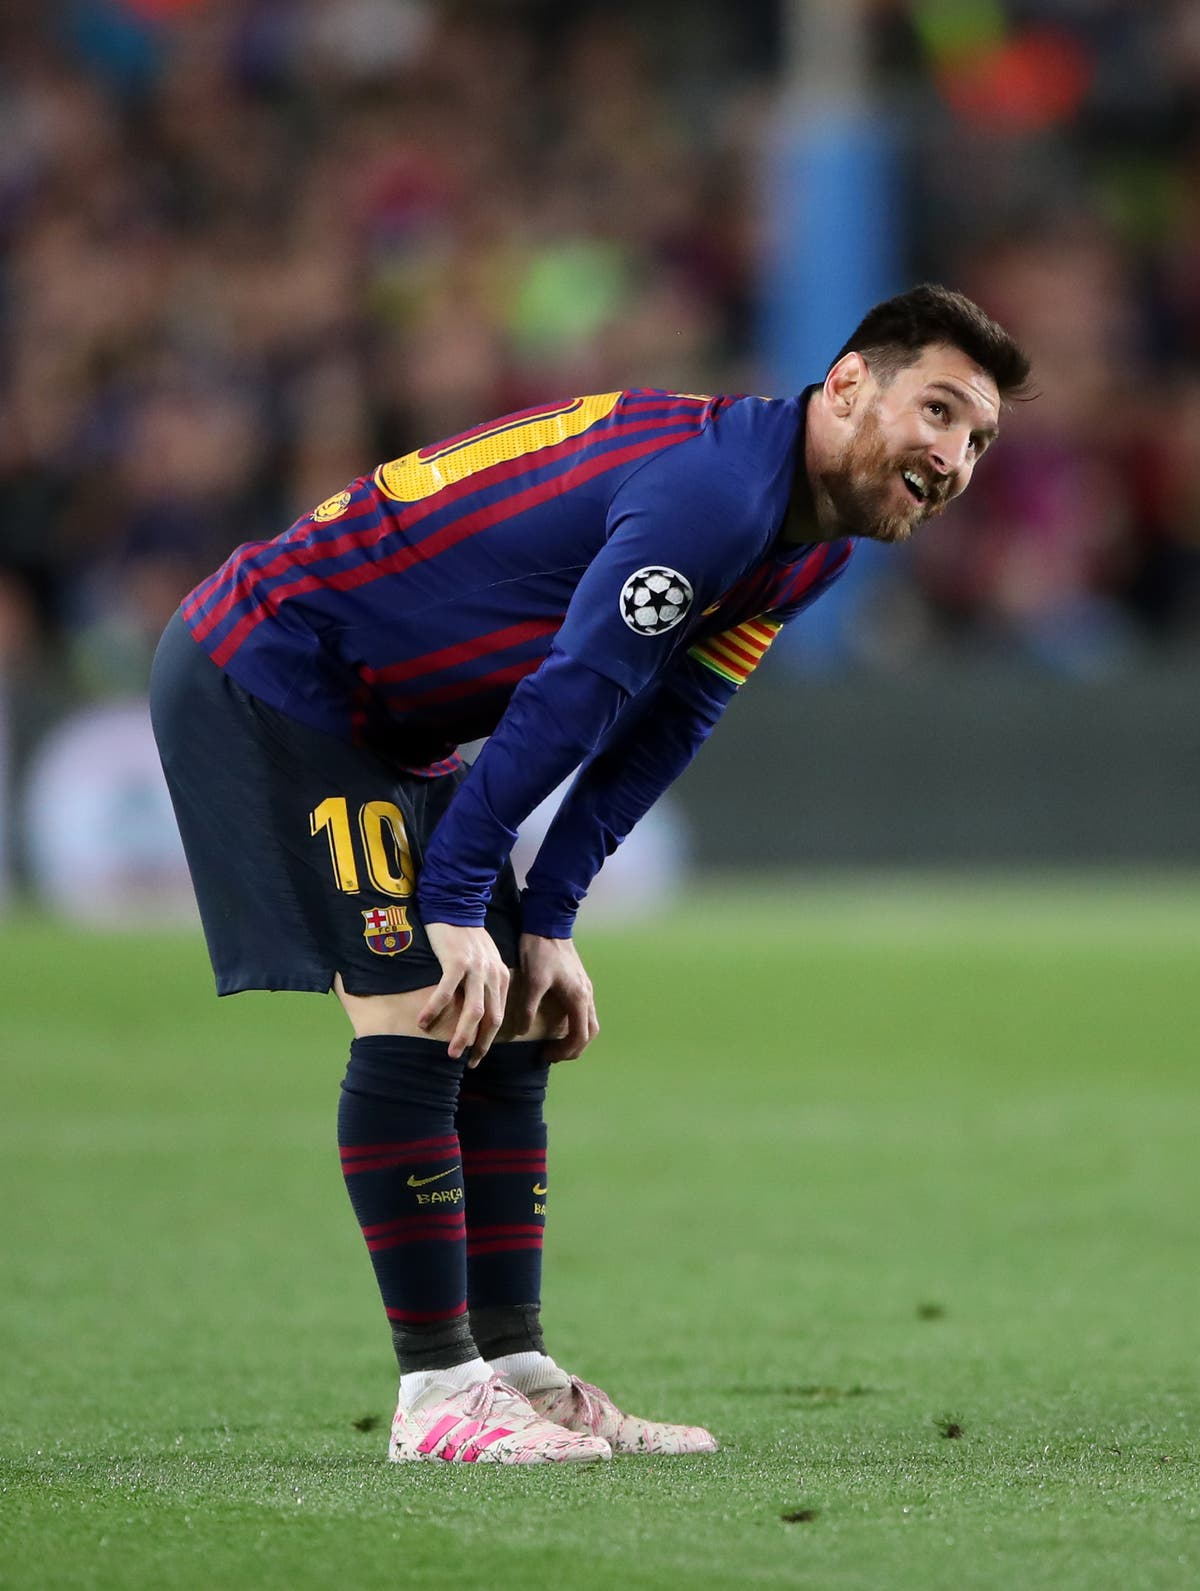 Barcelona boss Ronald Koeman admits Lionel Messi exit 'still hard to understand'